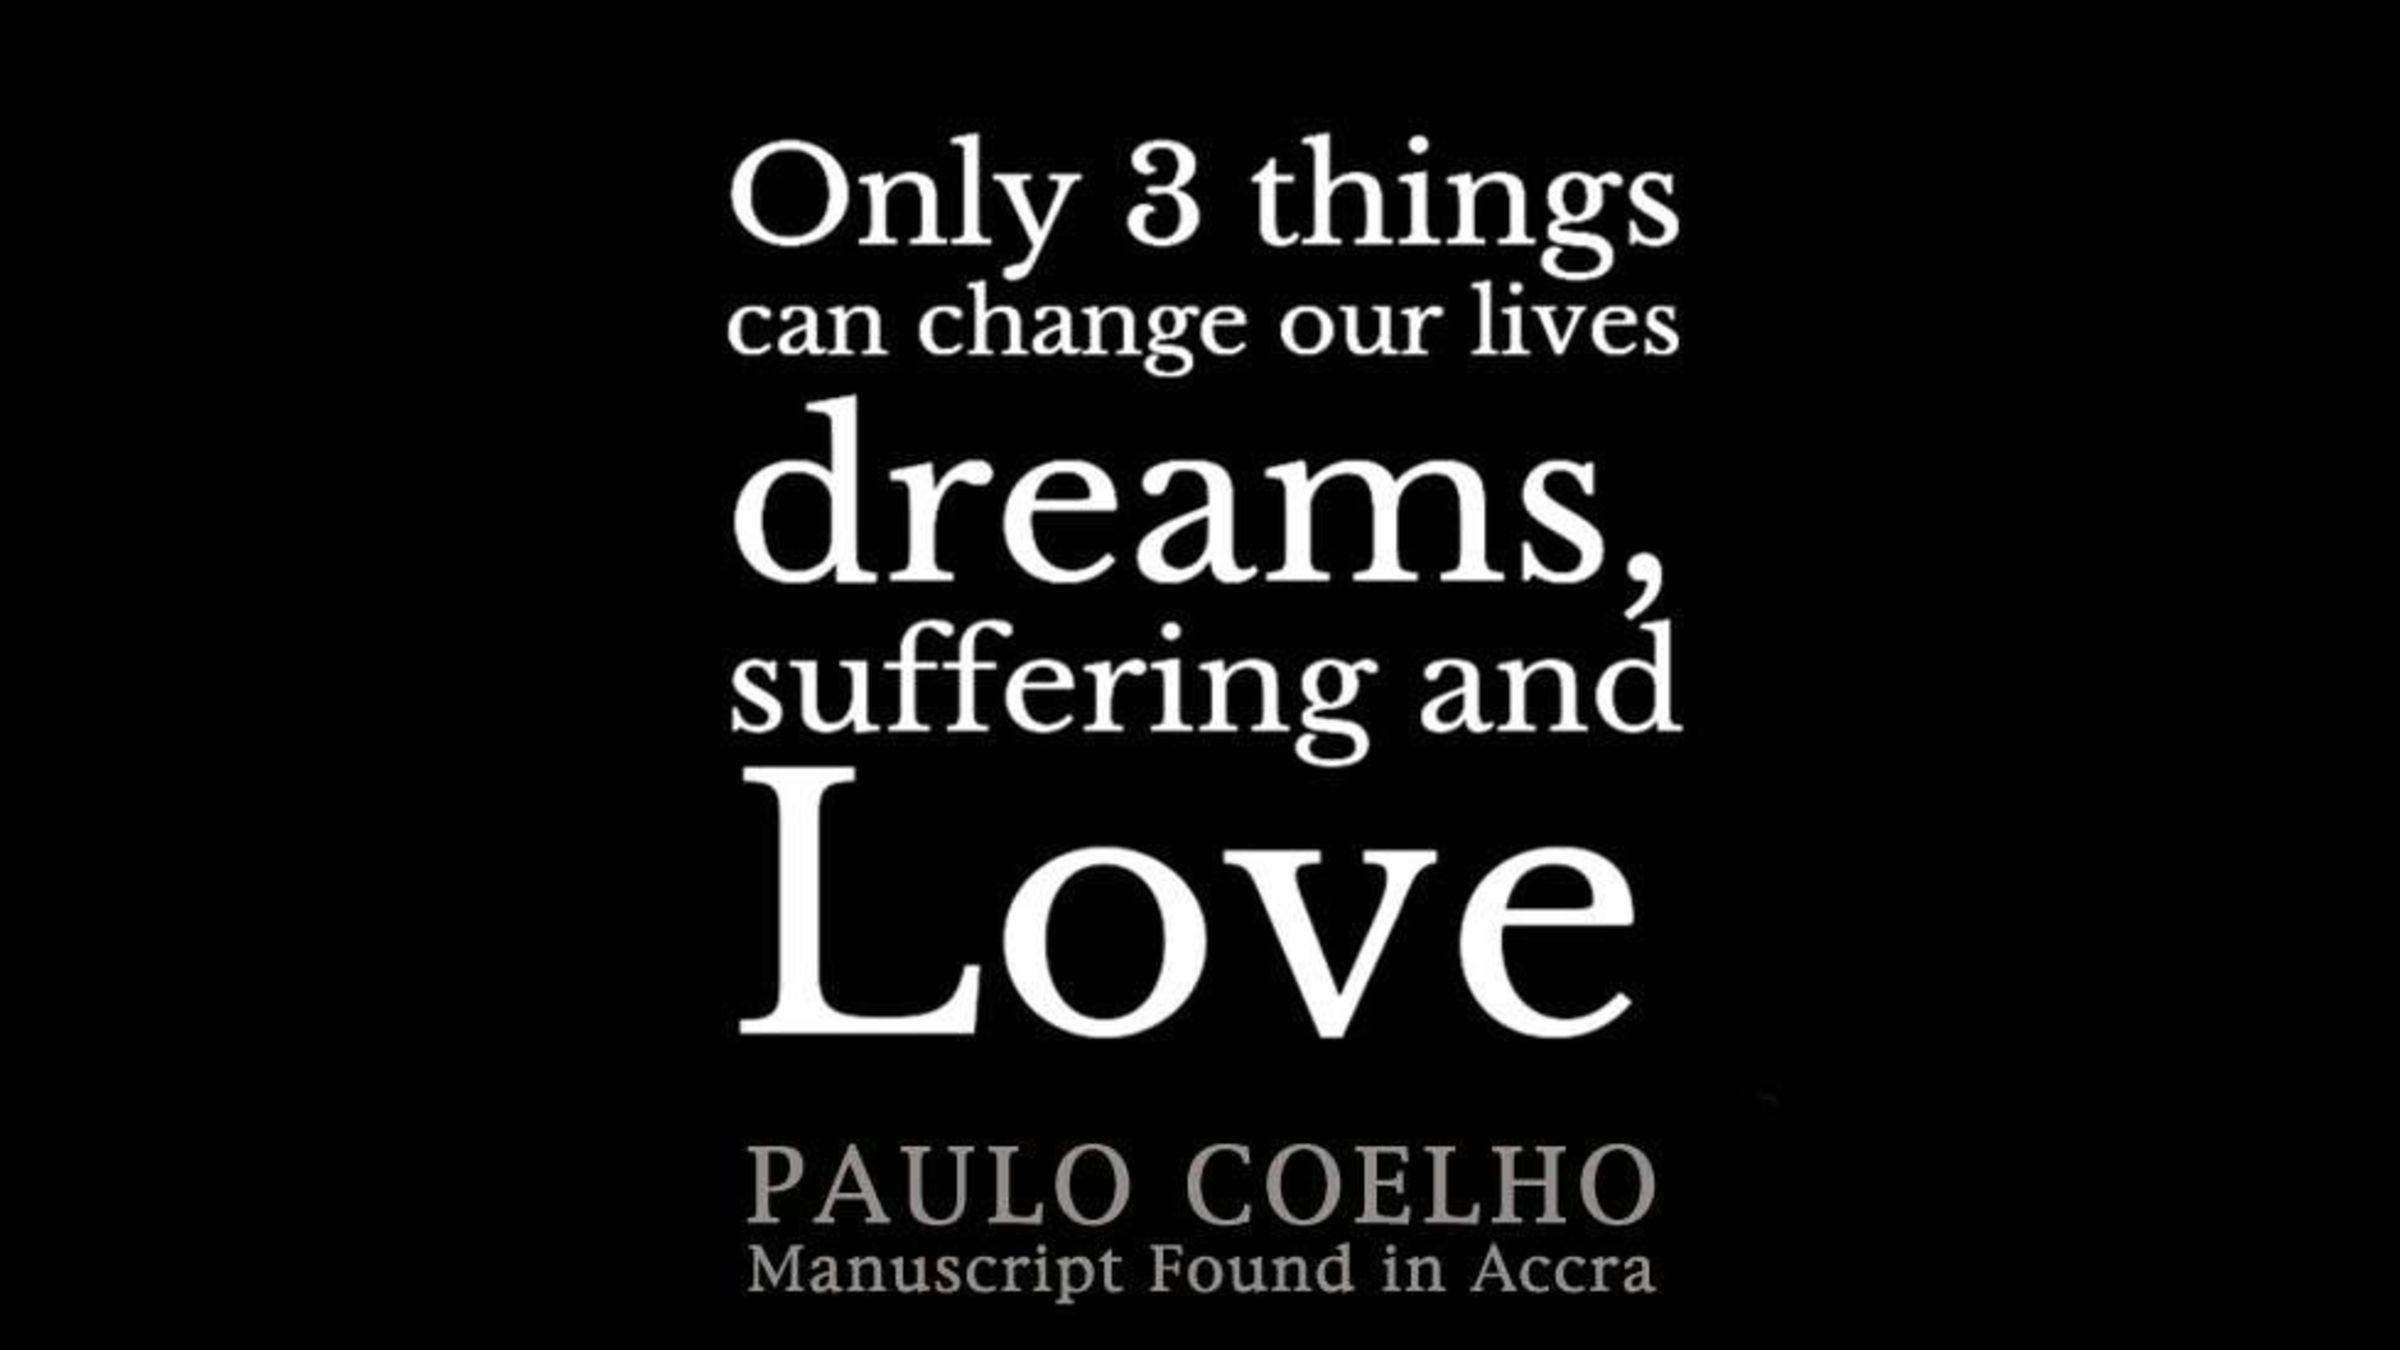 paulo coelho quotes author of the alchemist goodreads - HD2400×1350